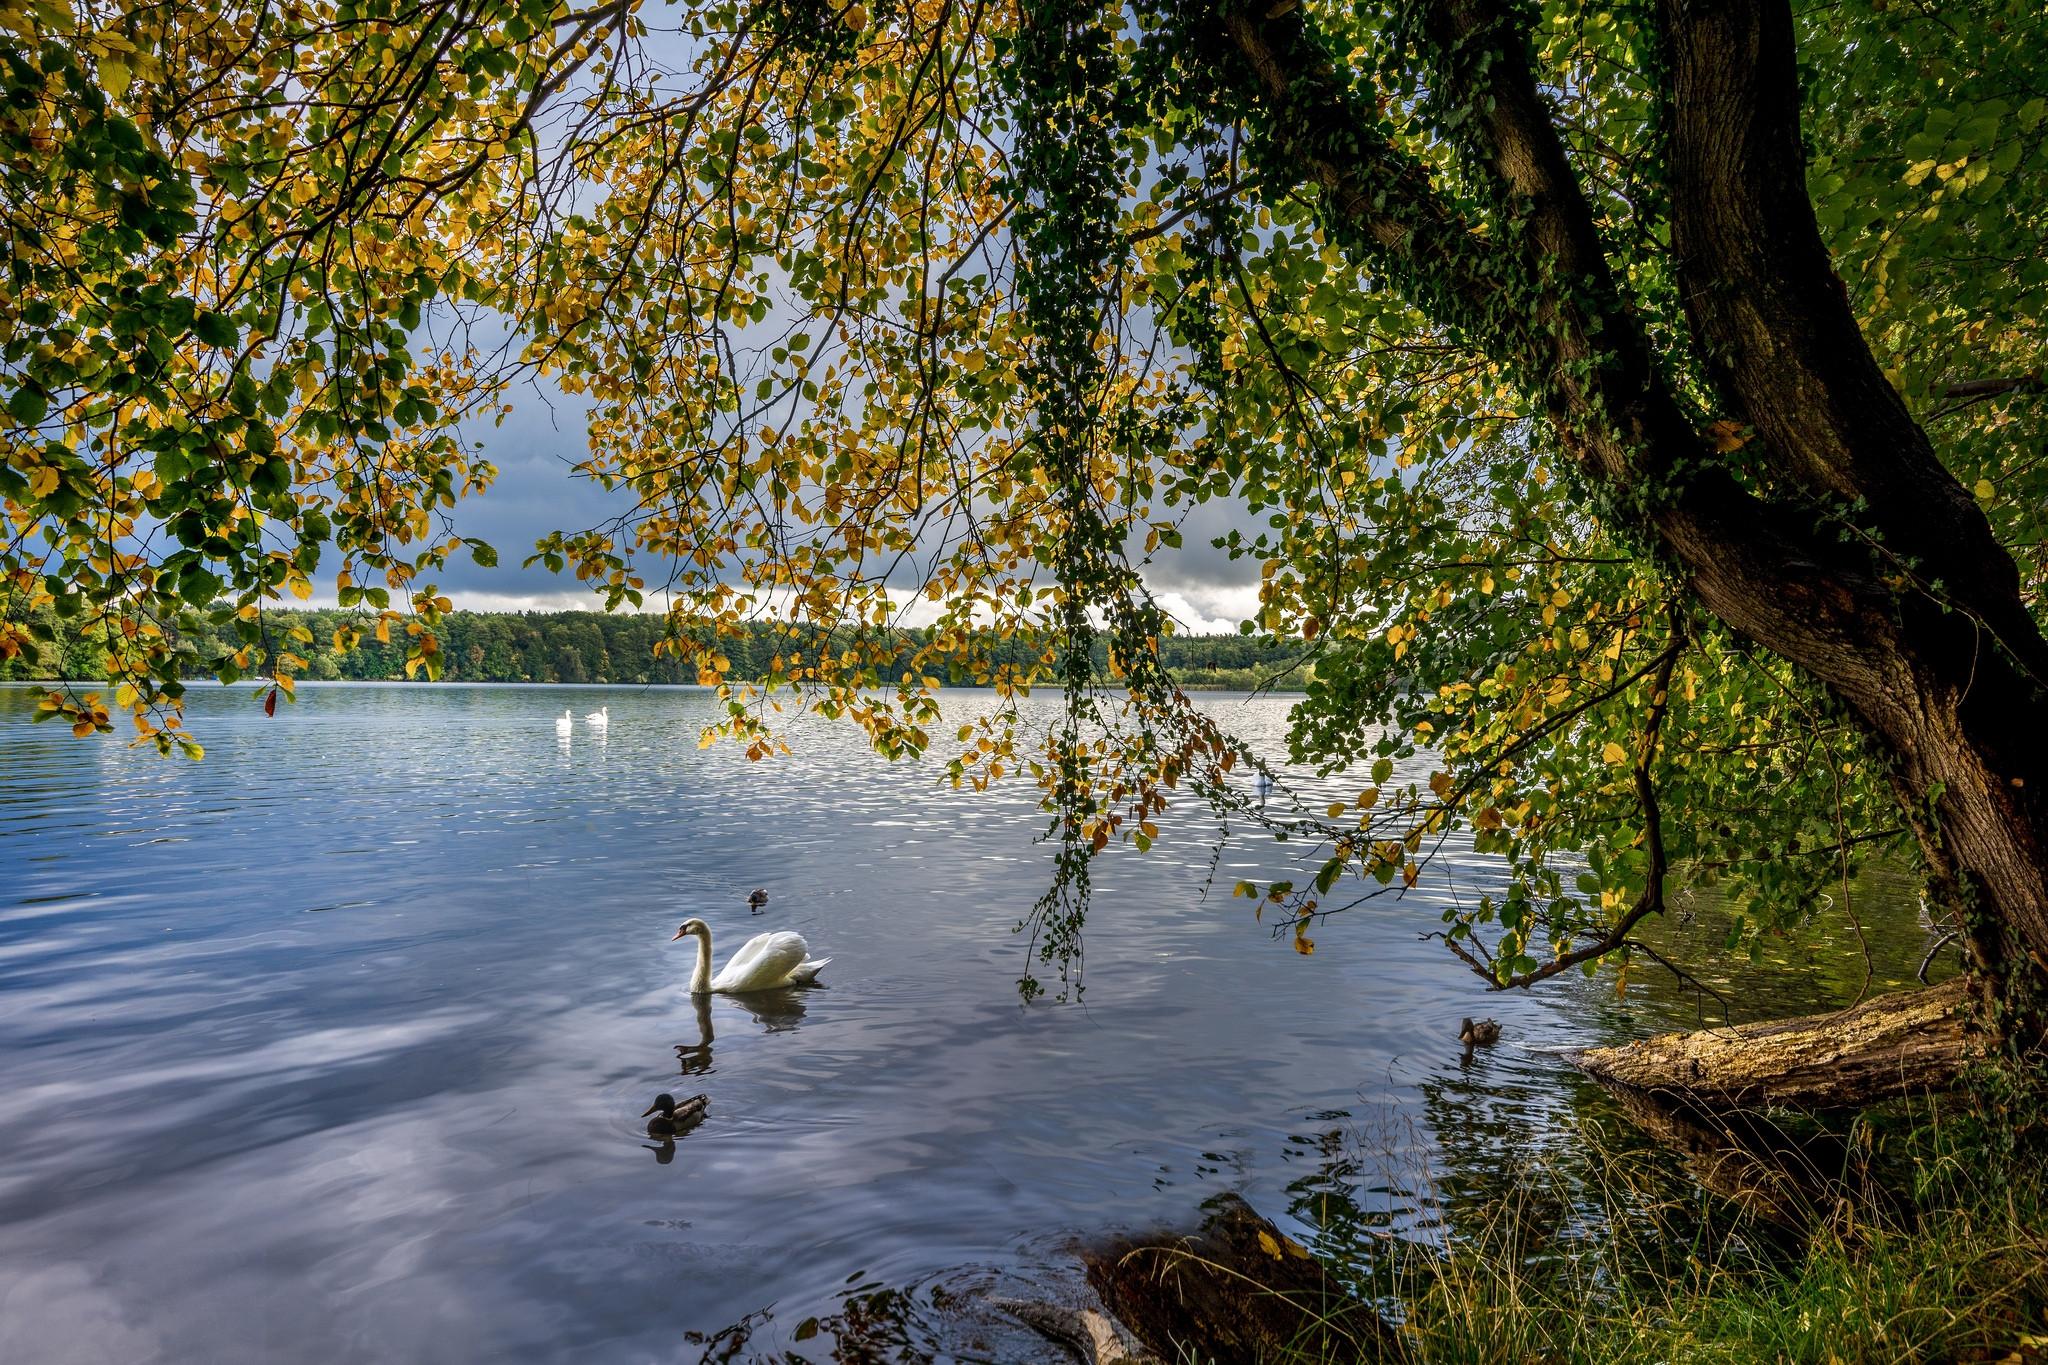 обои осень, река, деревья, лебеди картинки фото